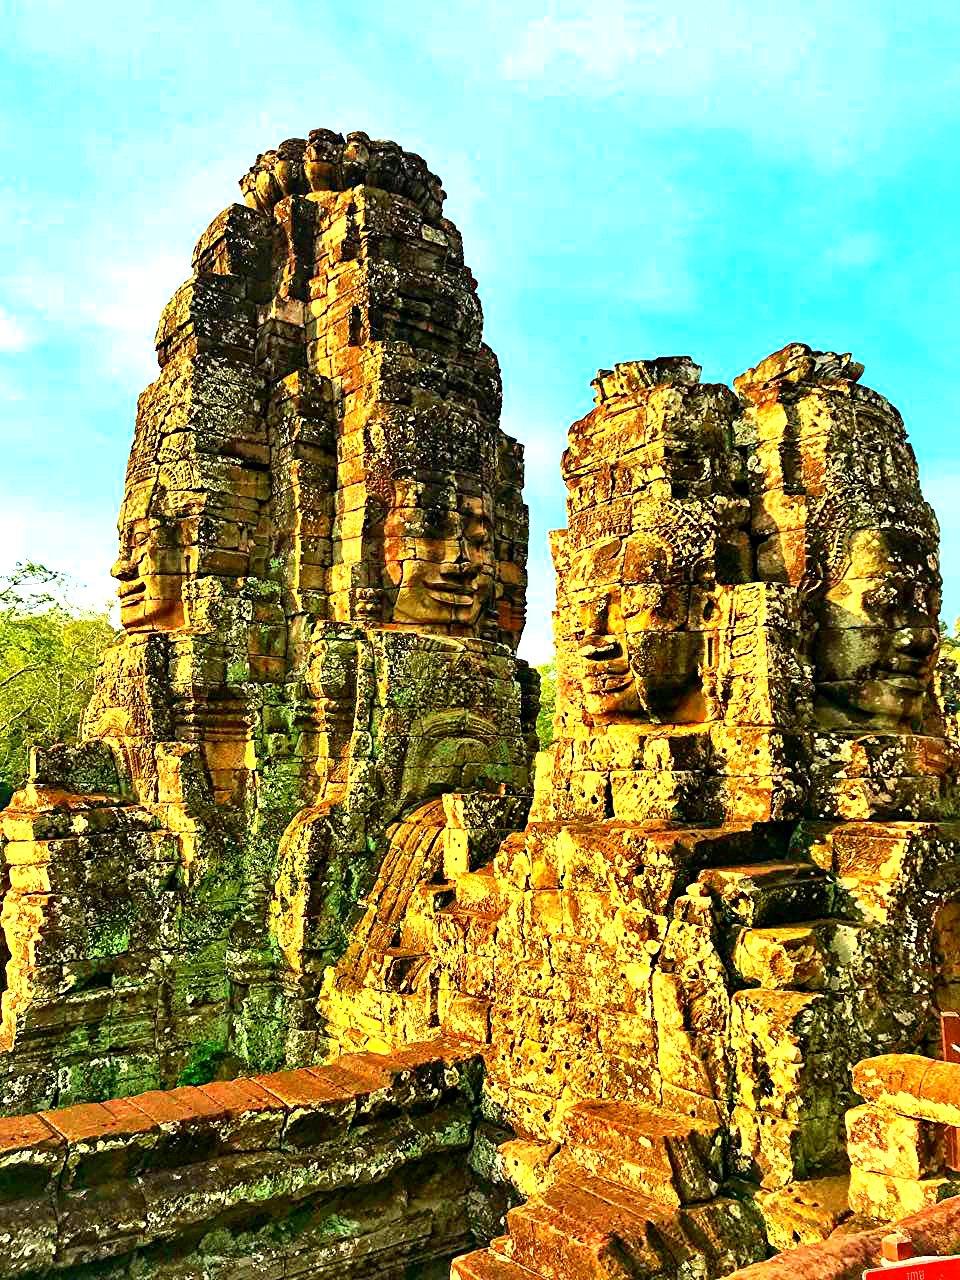 Елена Руденко (Валтея). Камбоджа. Ангкор. GHXBO7J9BD8